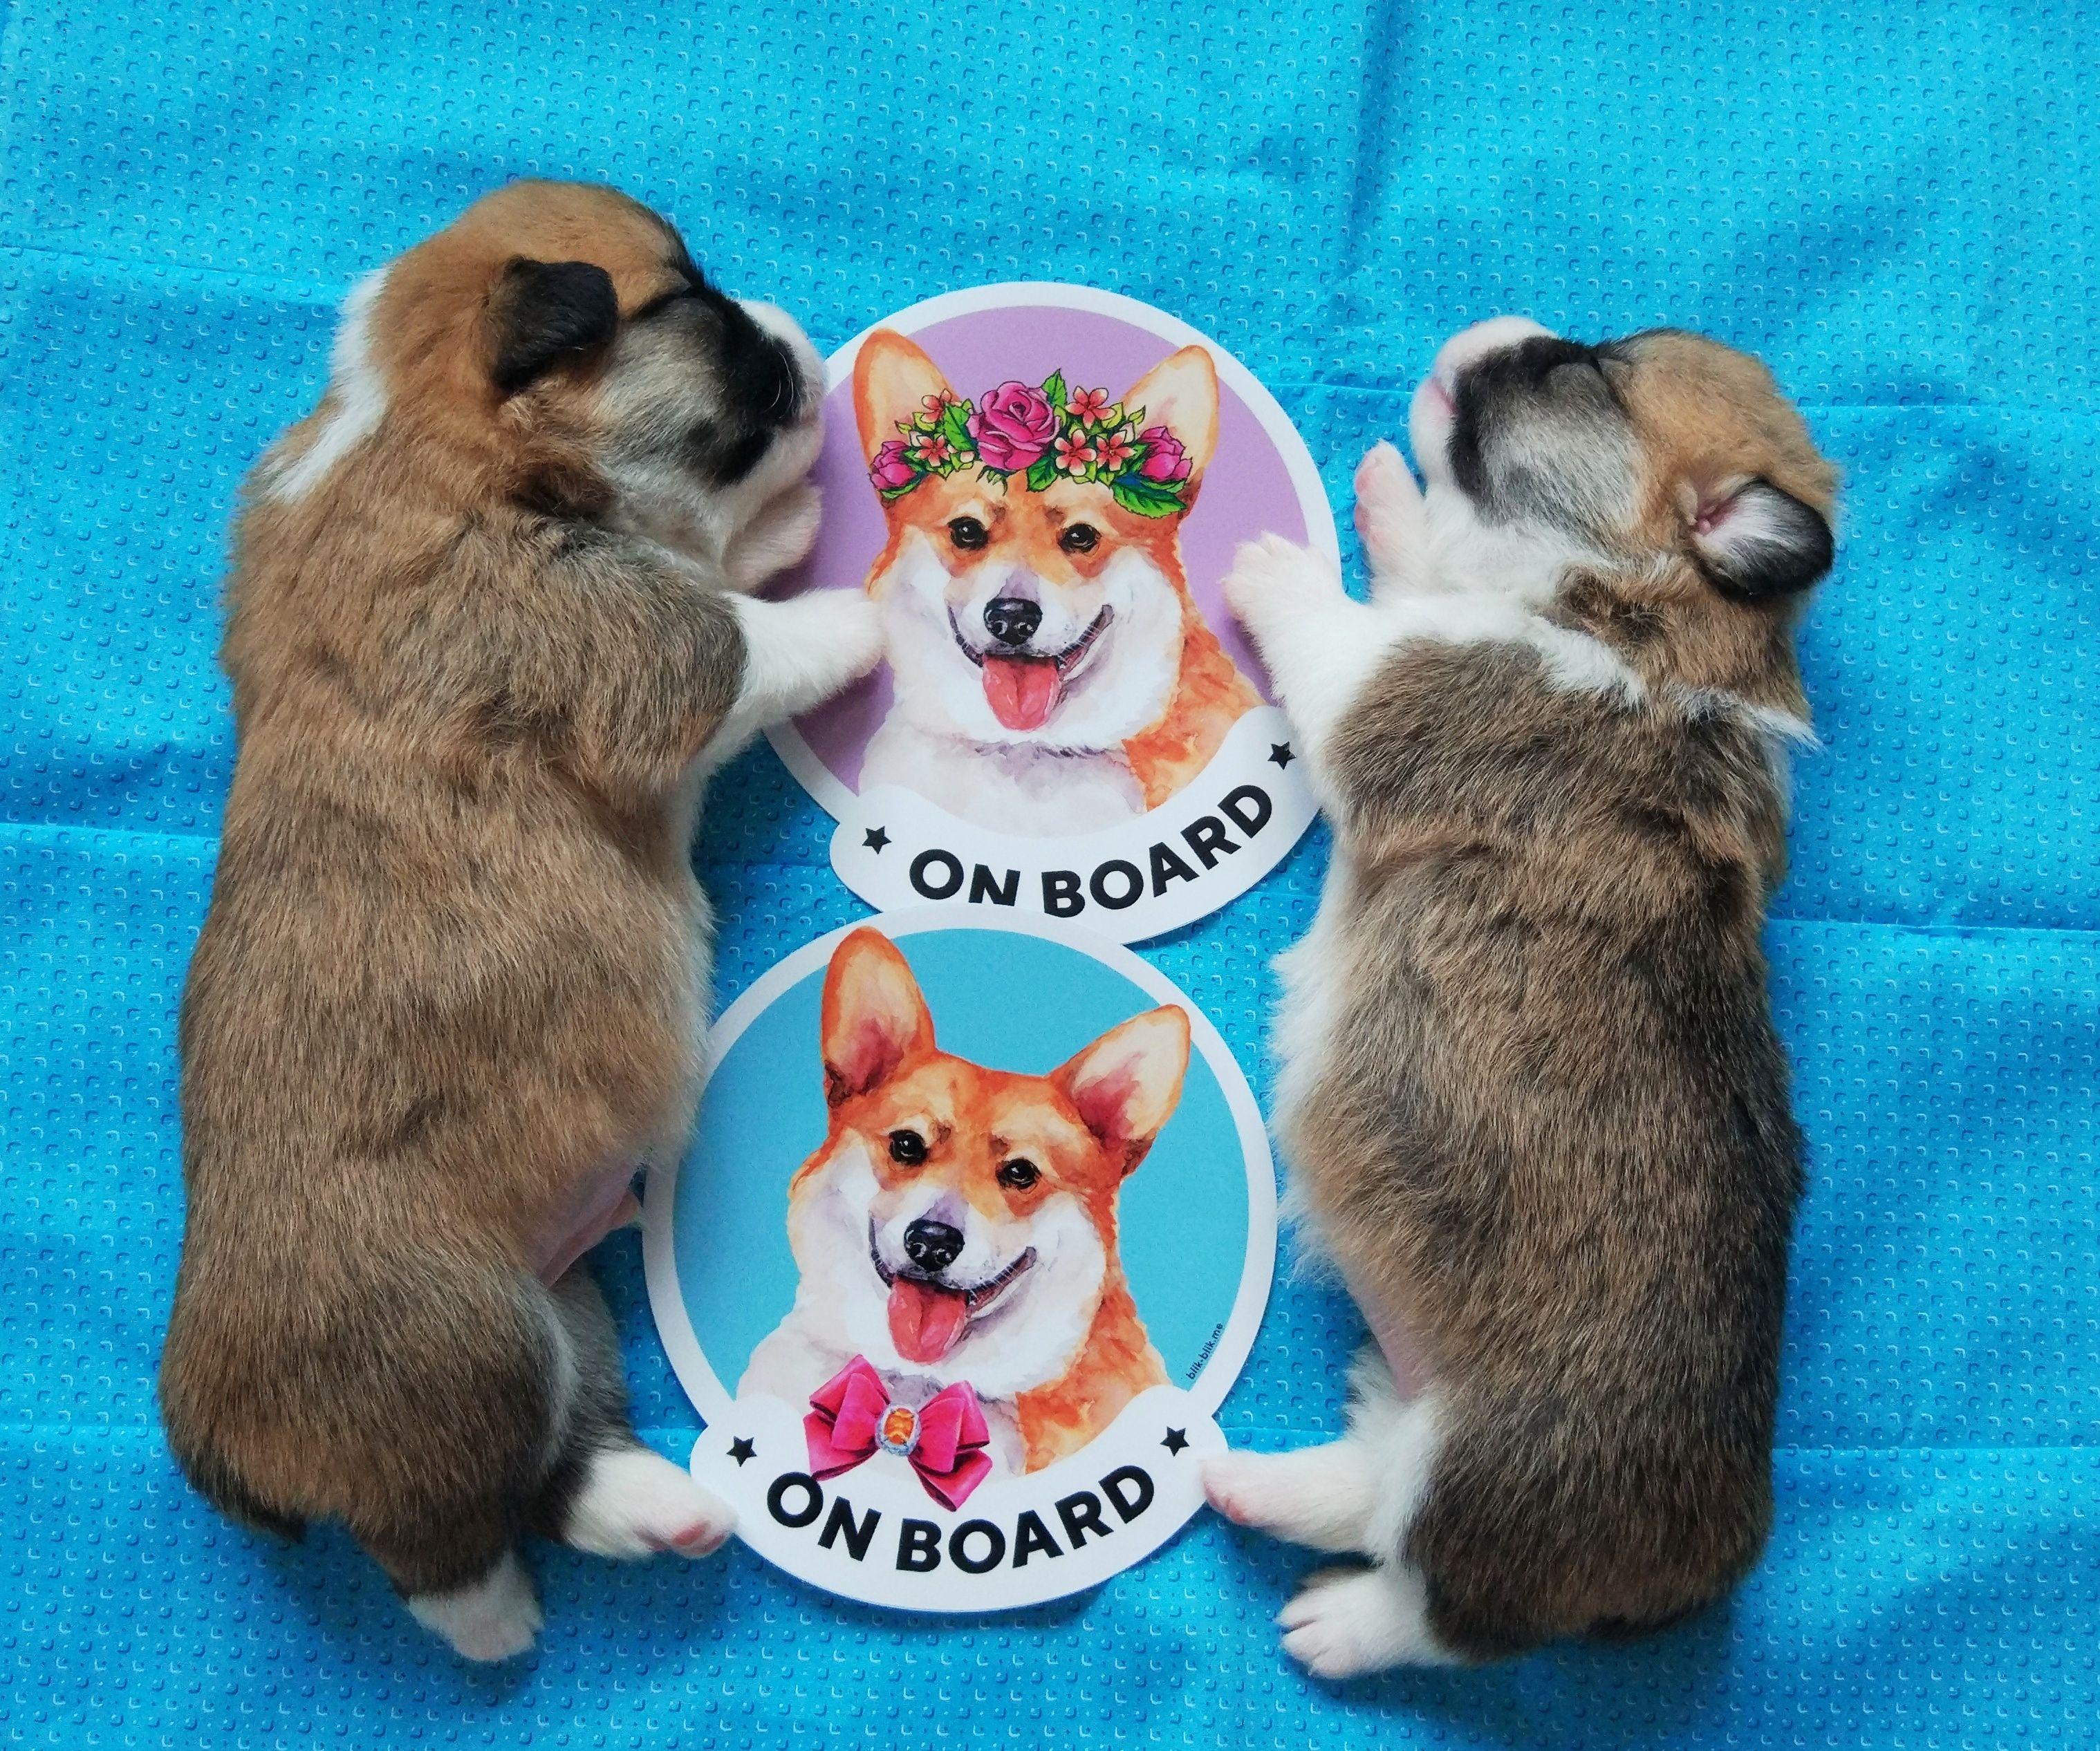 Pack Of Corgi On Board Car Window Stickers For Women Original Etsy Cute Corgi Puppy Dog Christmas Gifts Corgi [ 2533 x 3037 Pixel ]